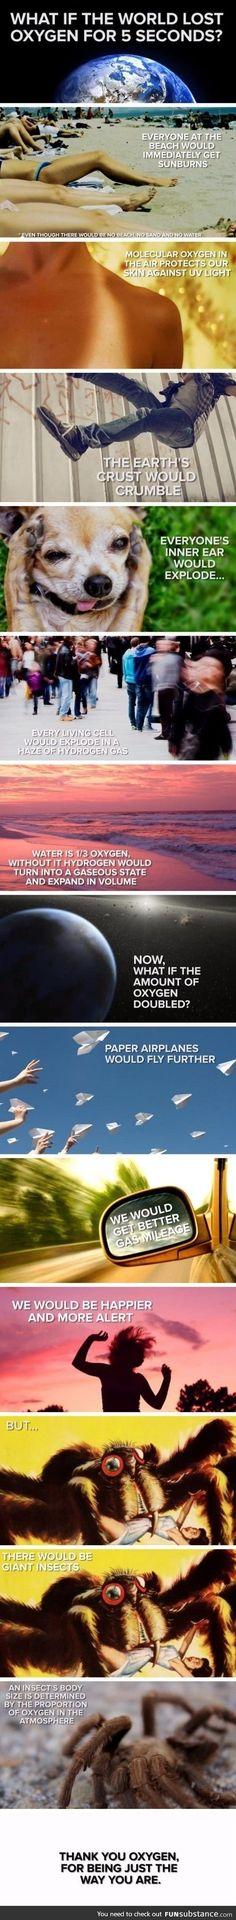 Oxygen changes